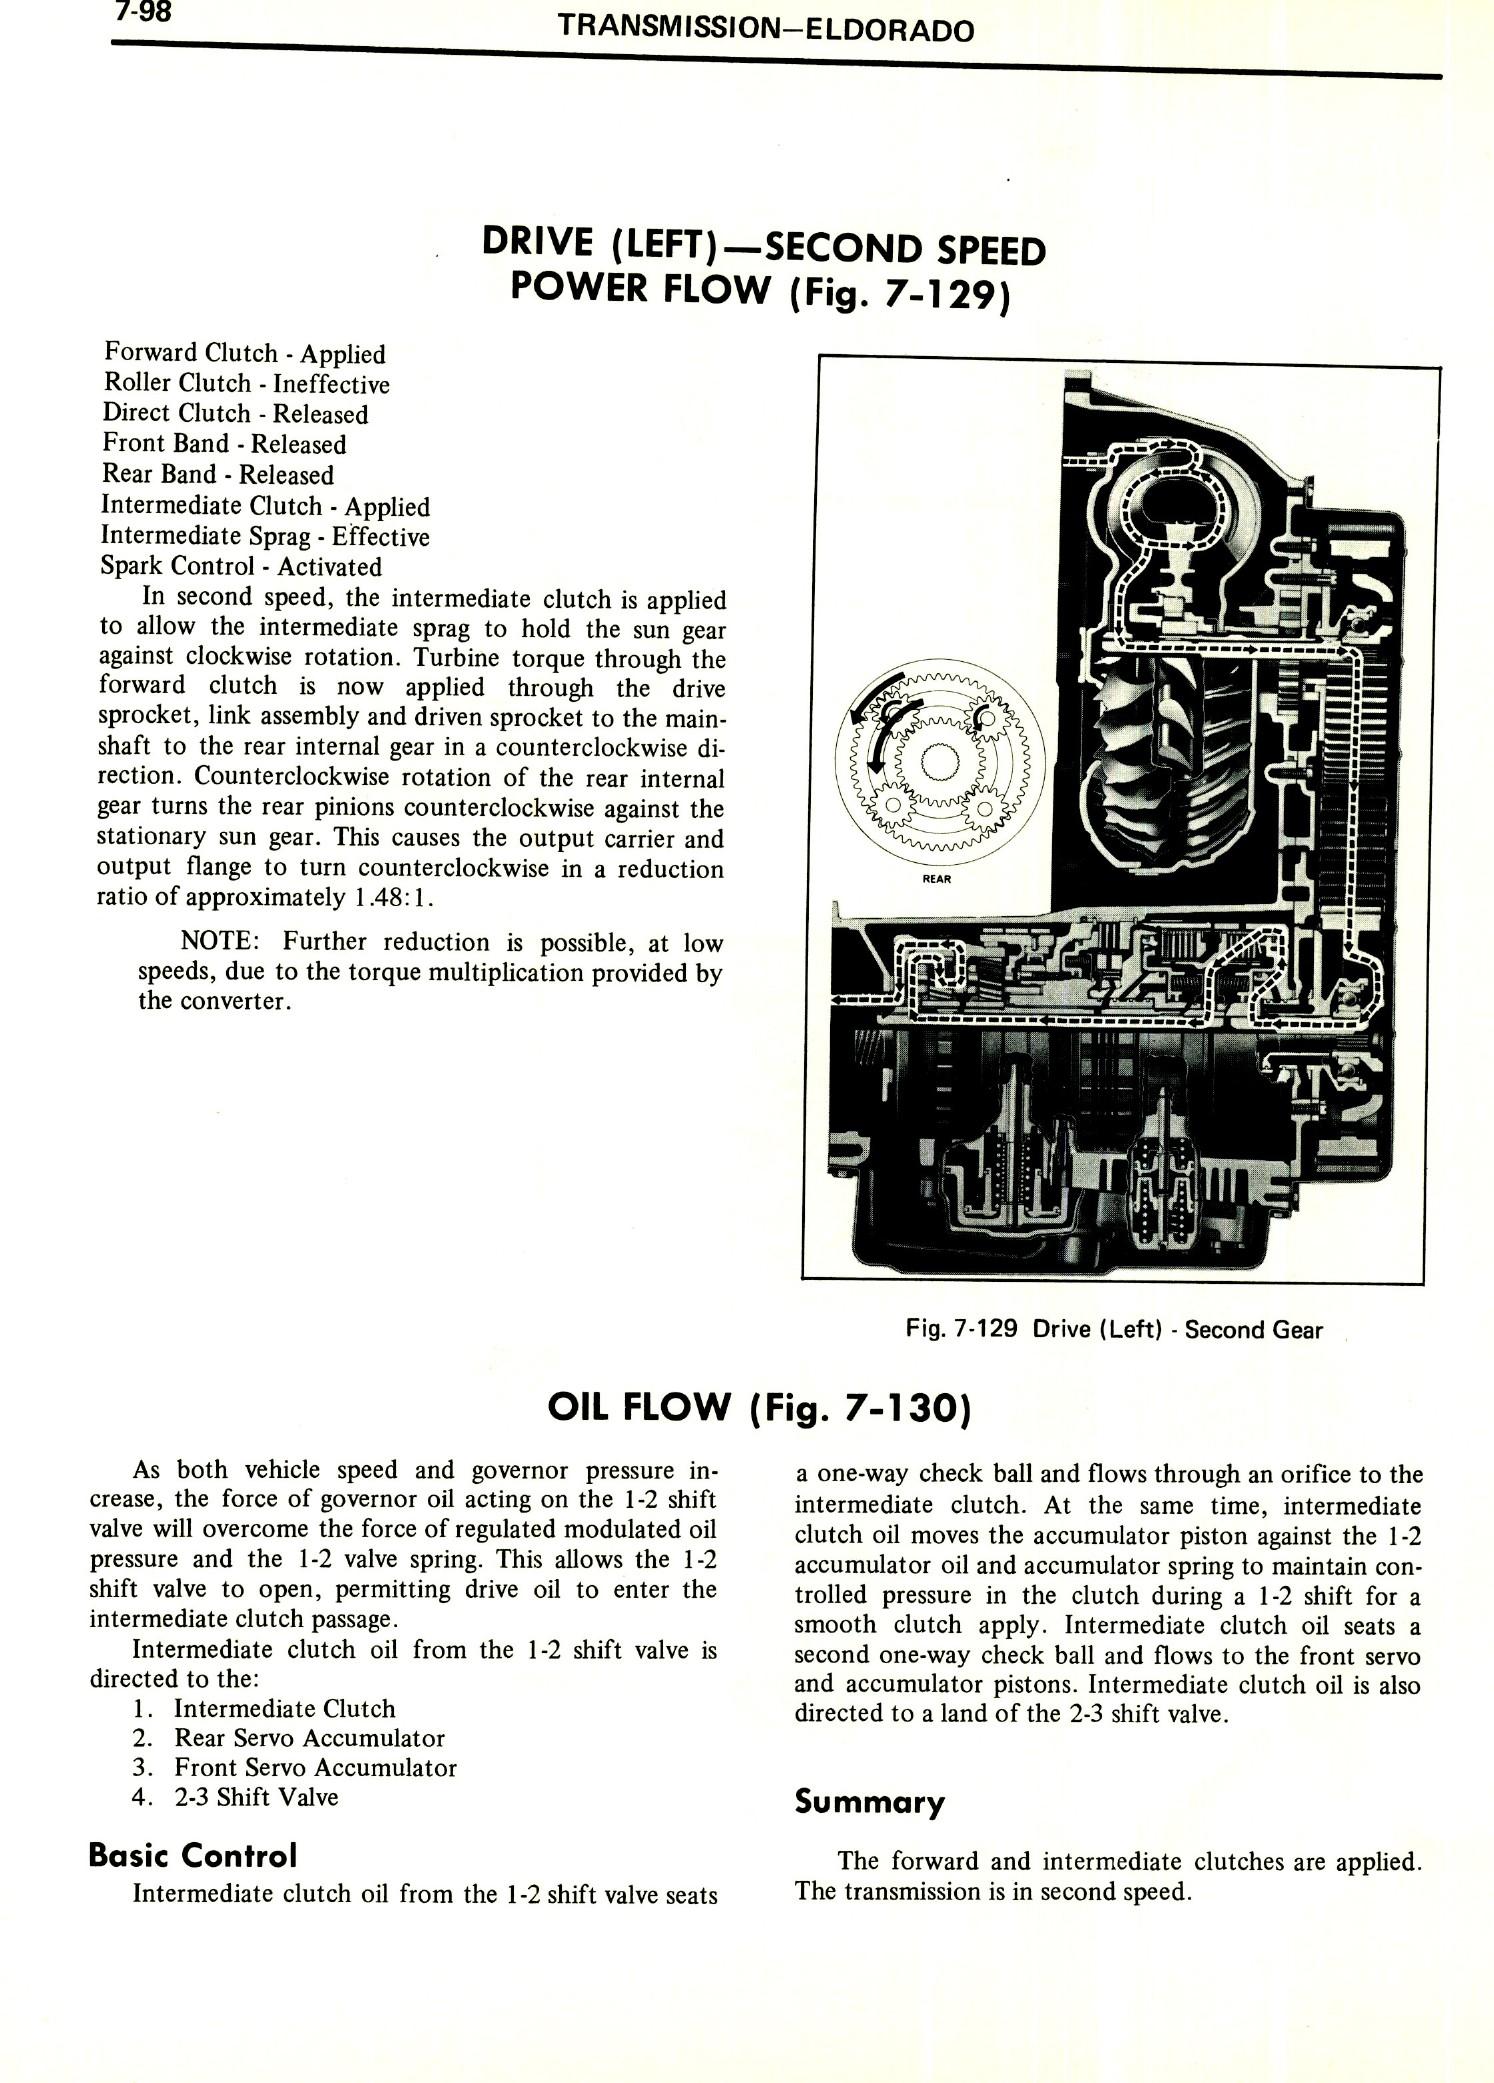 1971 Cadillac Shop Manual- Transmission Page 98 of 156